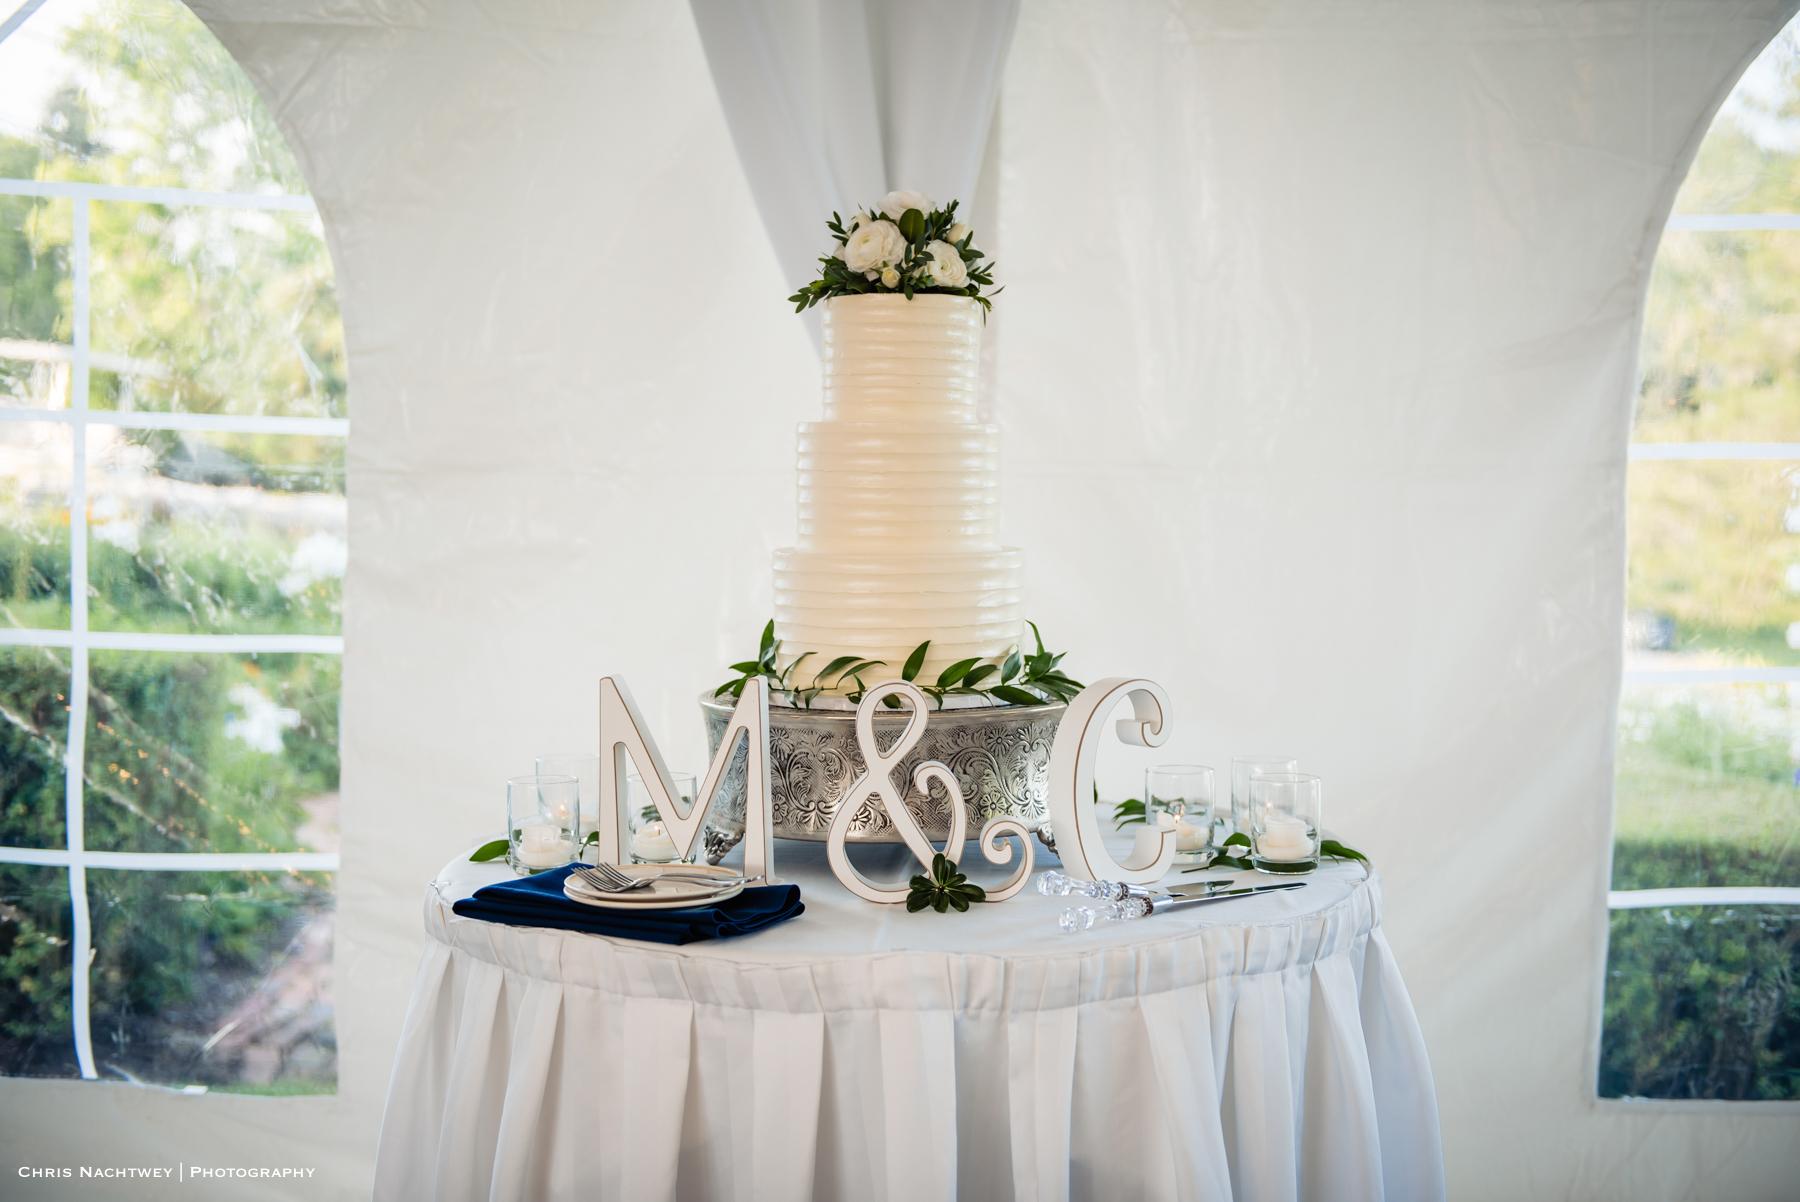 photos-wedding-haley-mansion-mystic-ct-chris-nachtwey-photography-2019-30.jpg